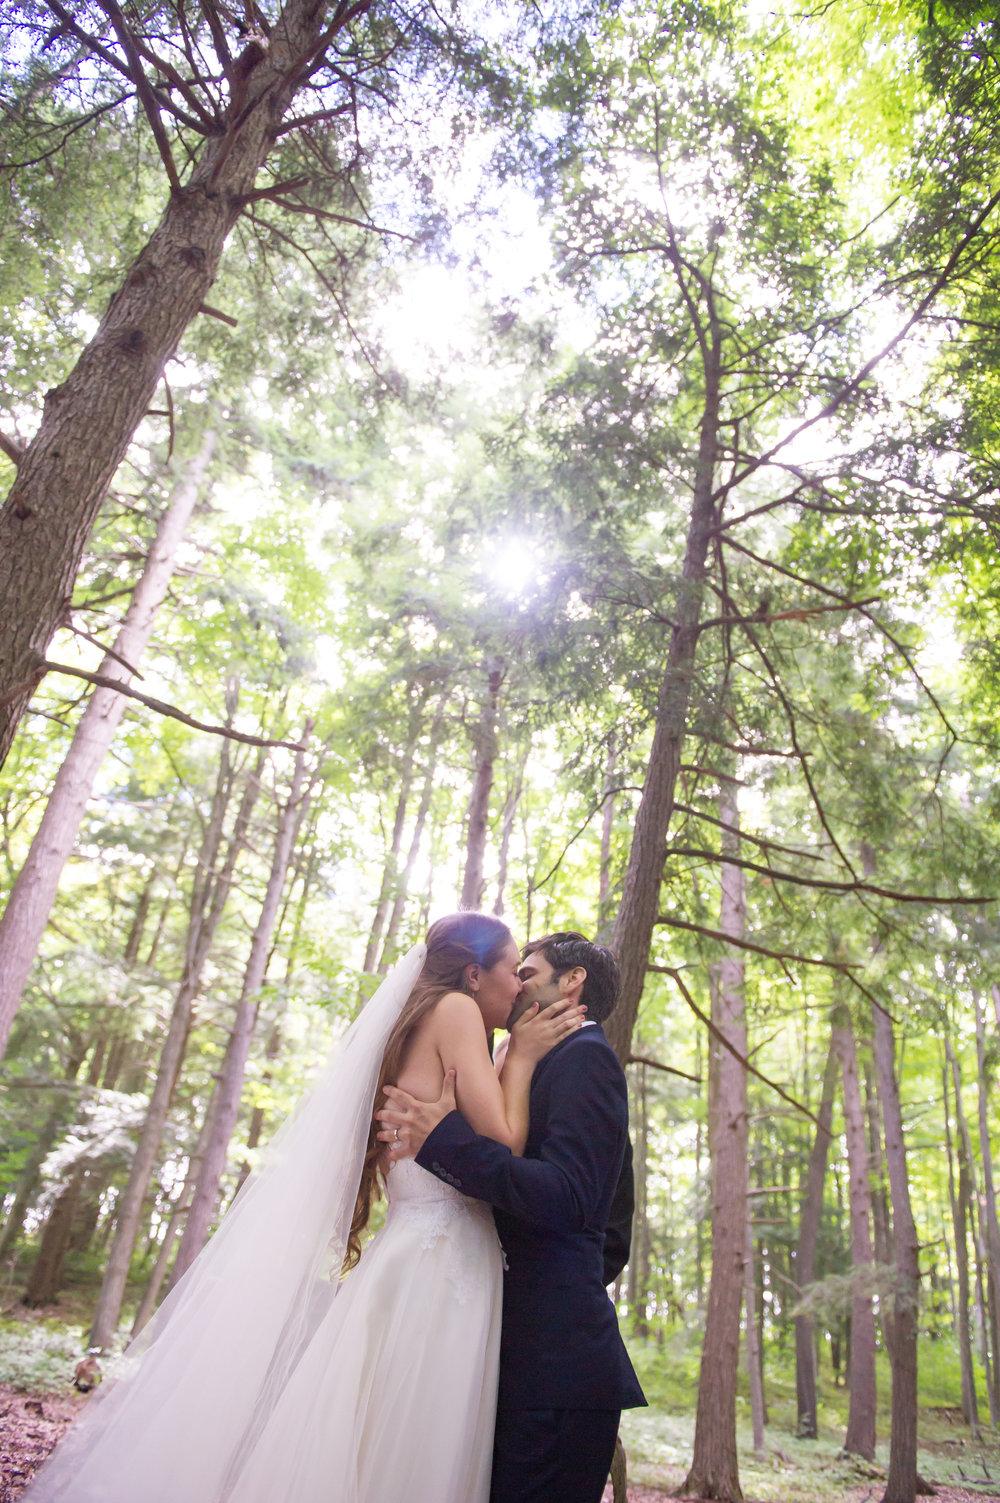 Wedding photography by Karmel Kreative // Plant Based Bride